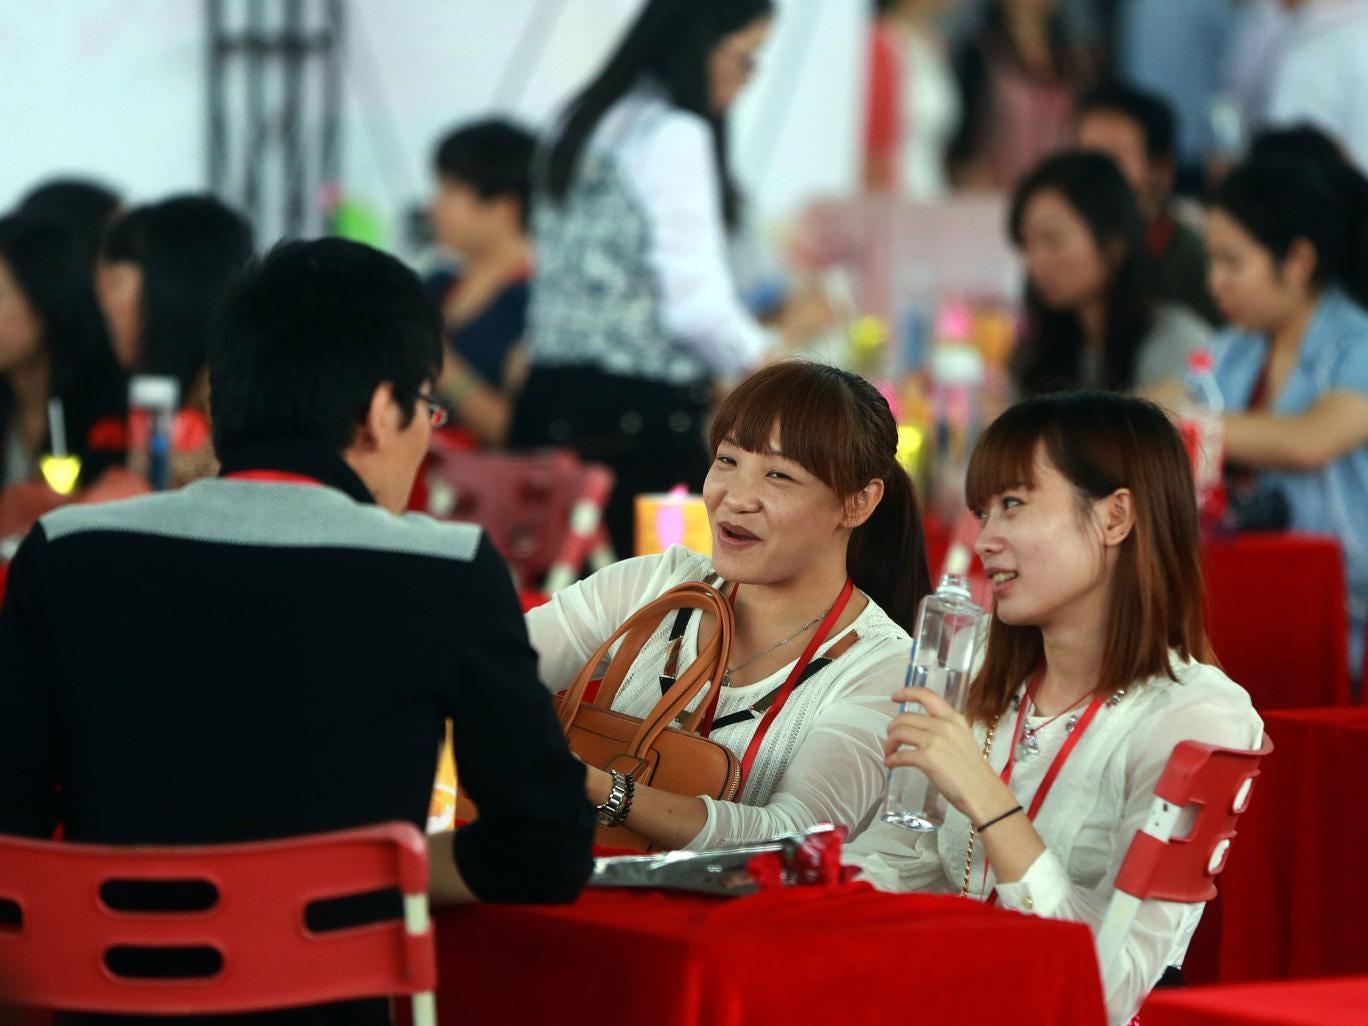 Dongguan dating